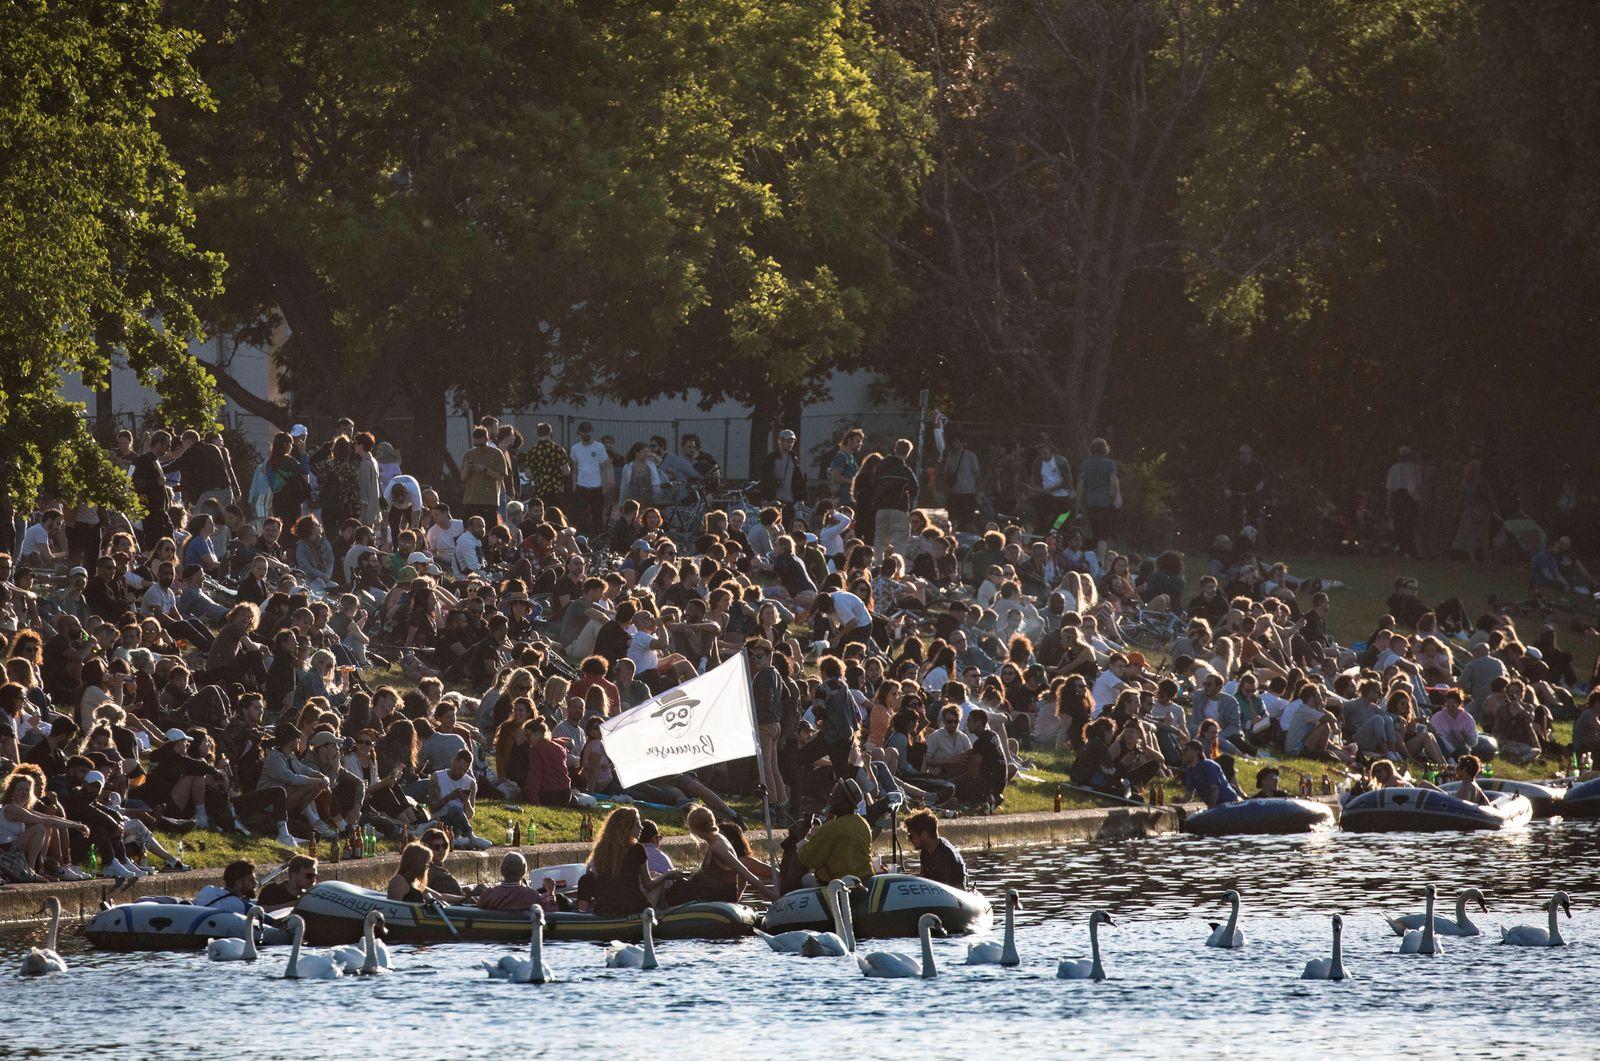 May 31, 2020, Berlin, Berlin, Germany: People enjoy an afternoon on the Landwehr Canal (Landwehrkanal) river in Berlin,